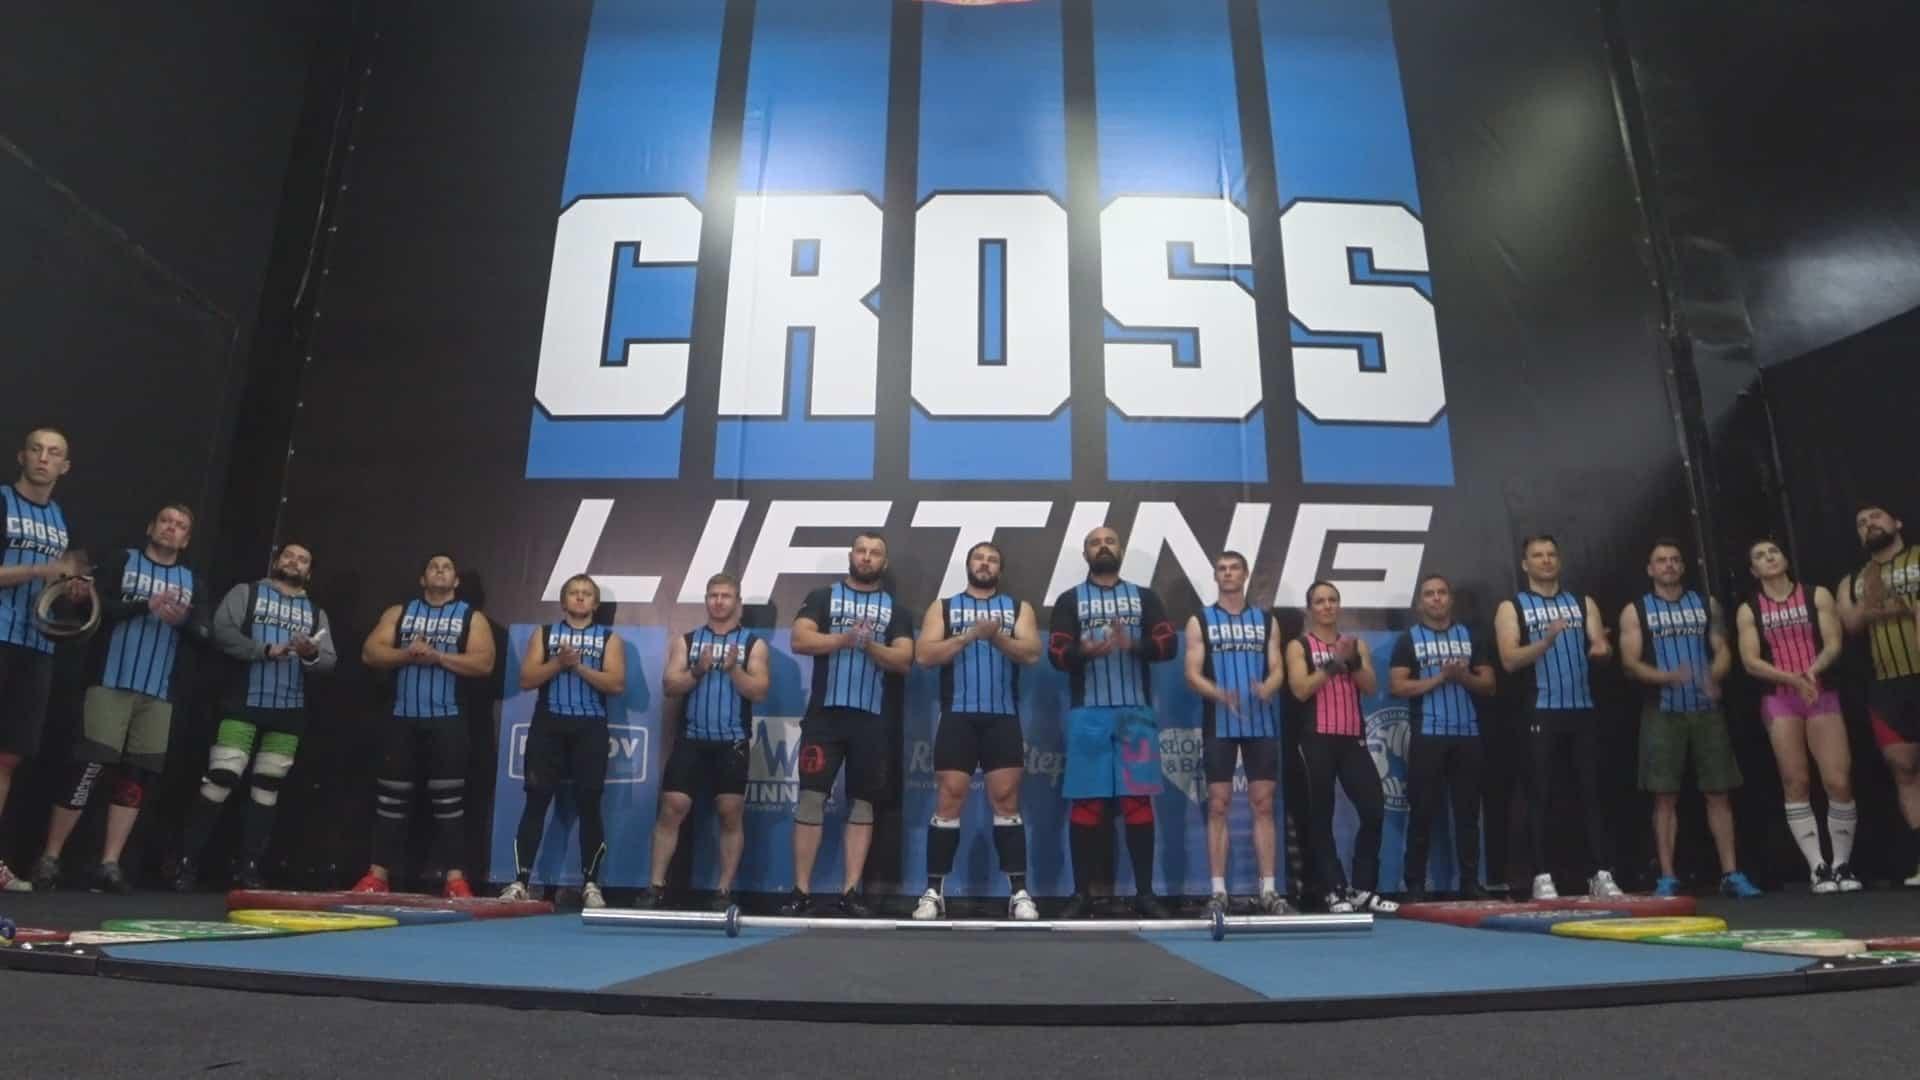 Crosslifting-Lets Square6-jerk